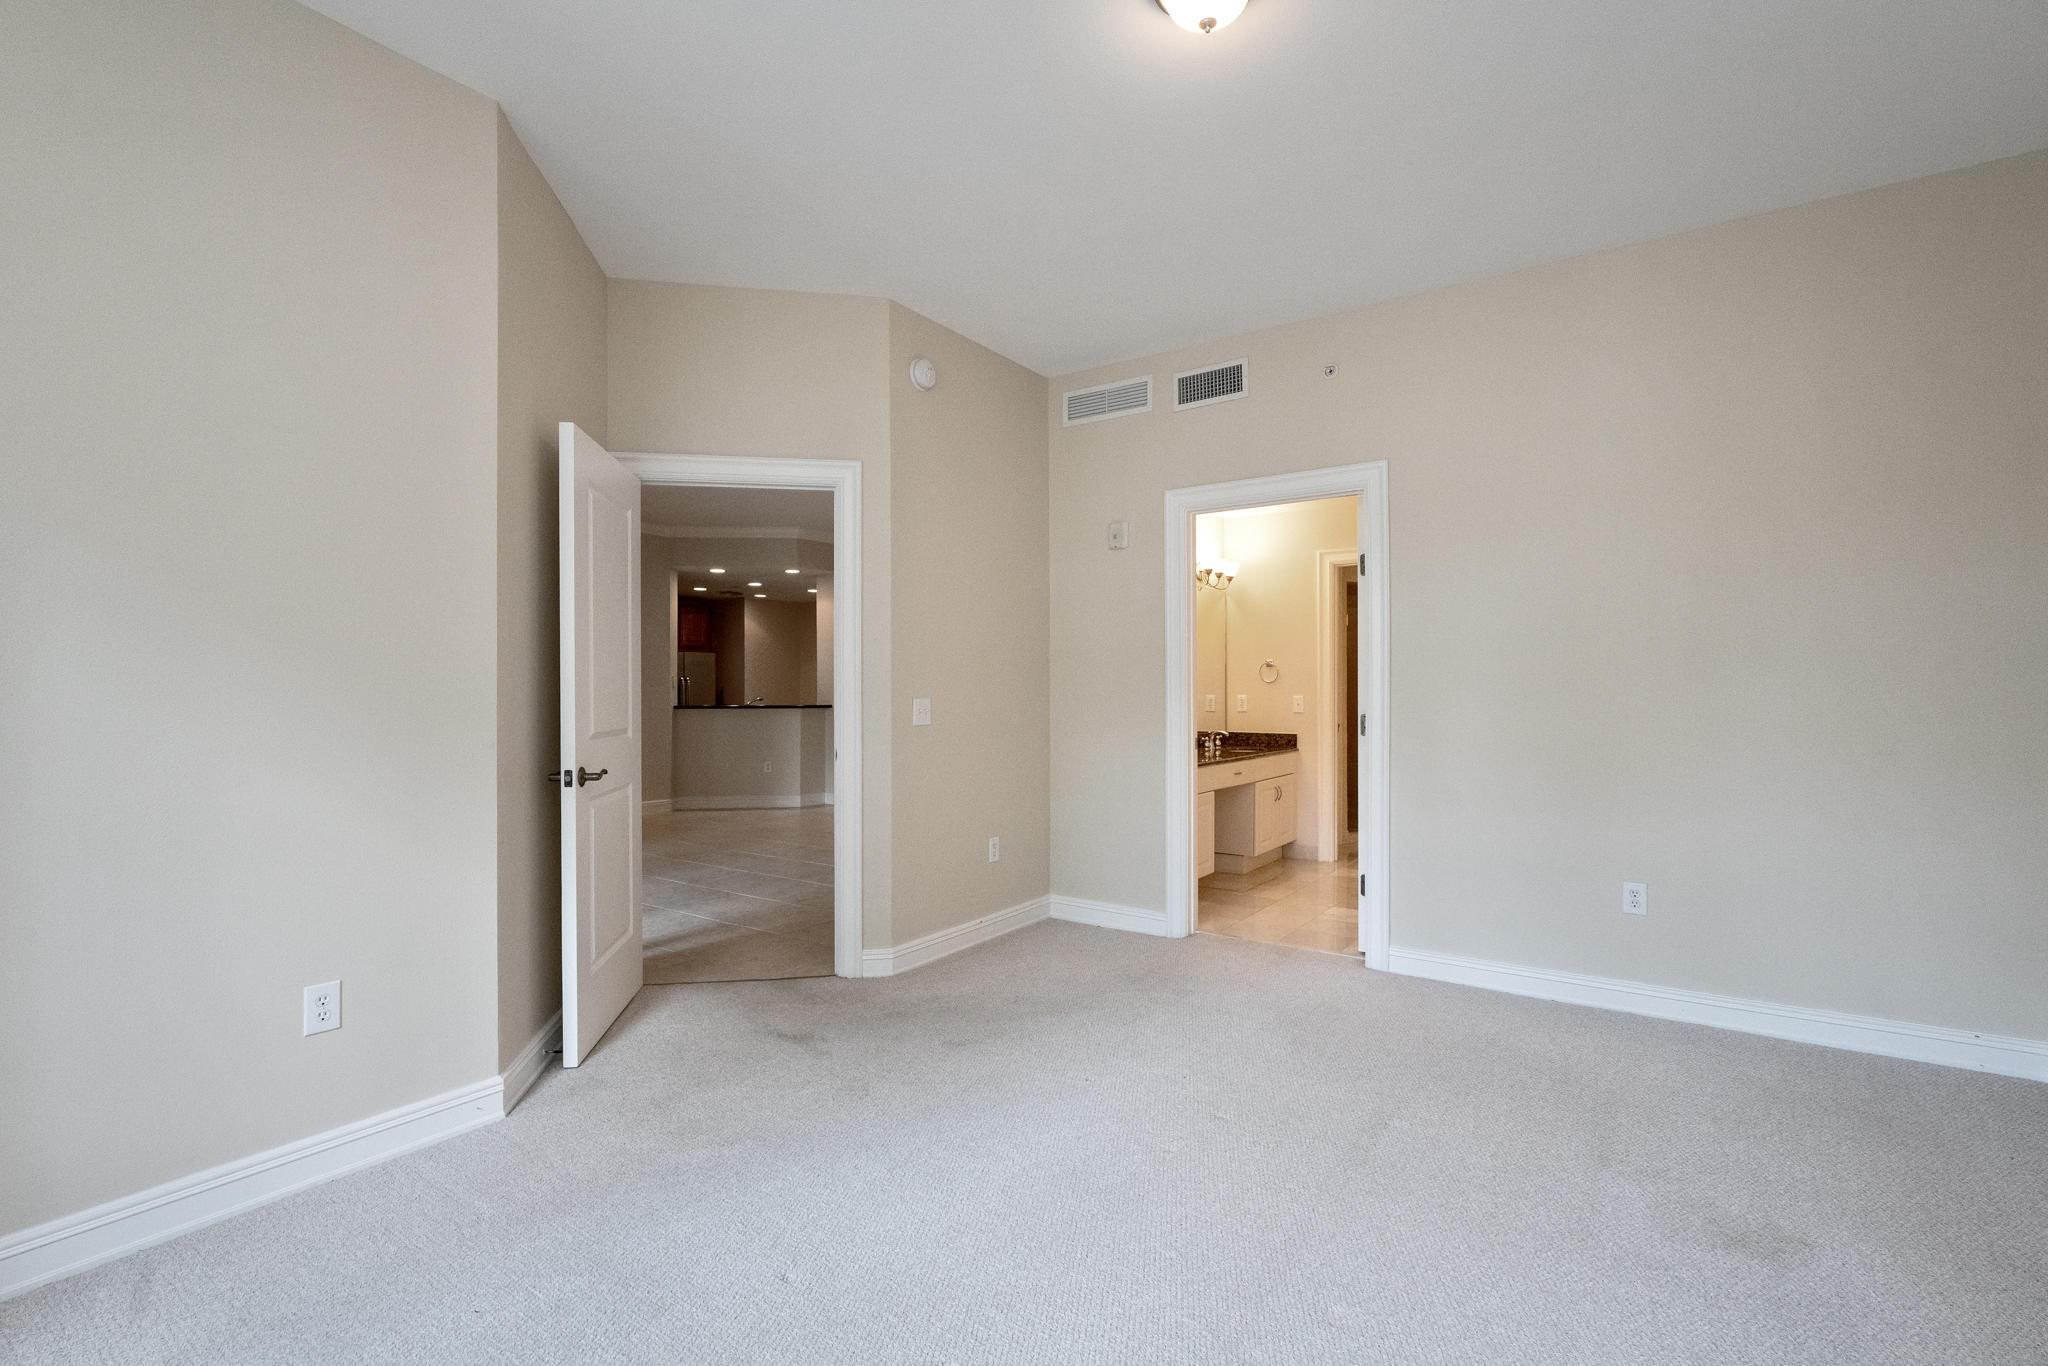 Image 27 For 16100 Emerald Estates Drive 390